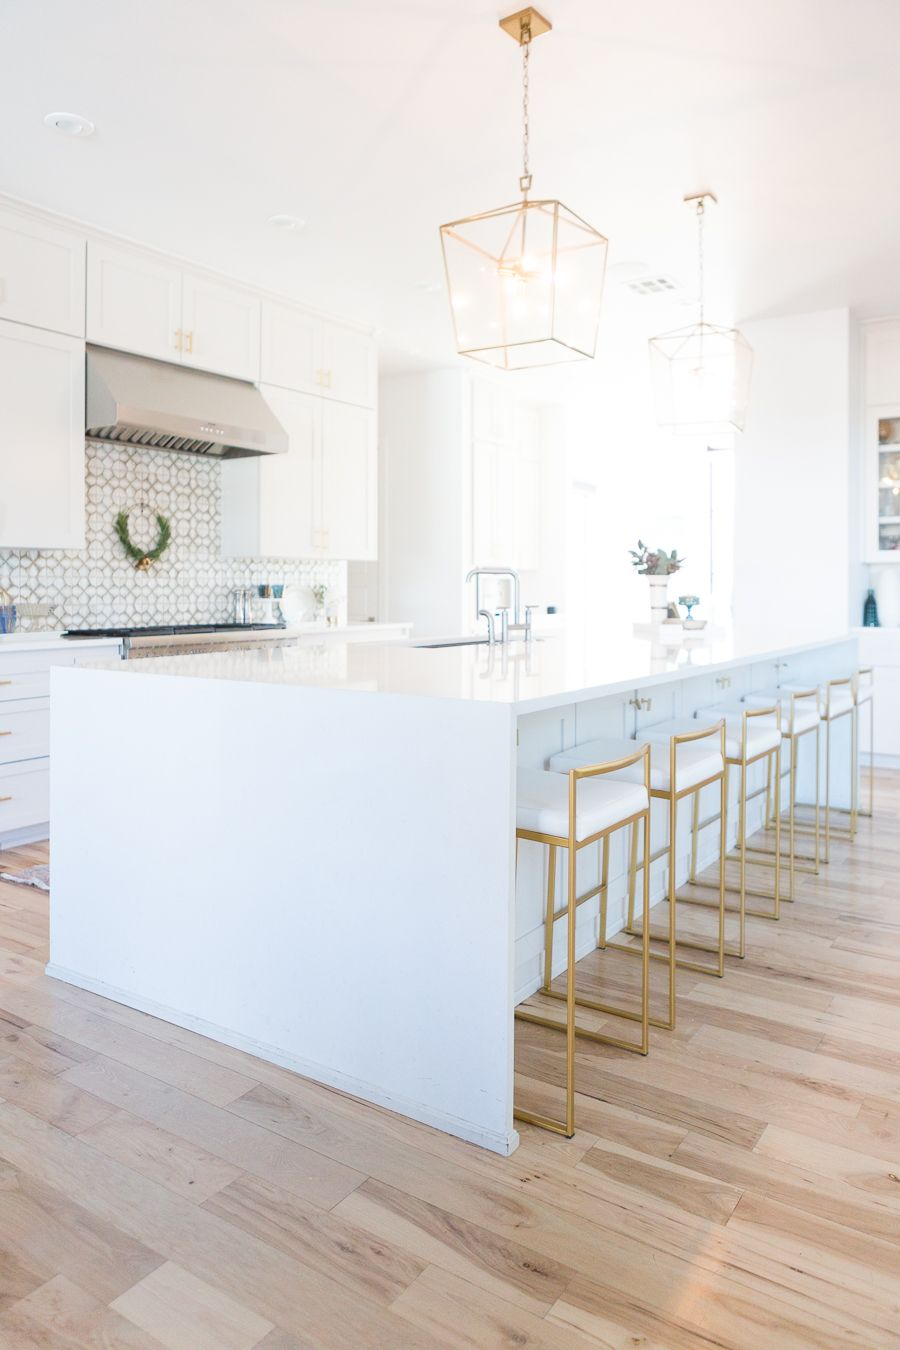 10 Affordable Gold Bar Stools for Home Design | Gold bar stools ...